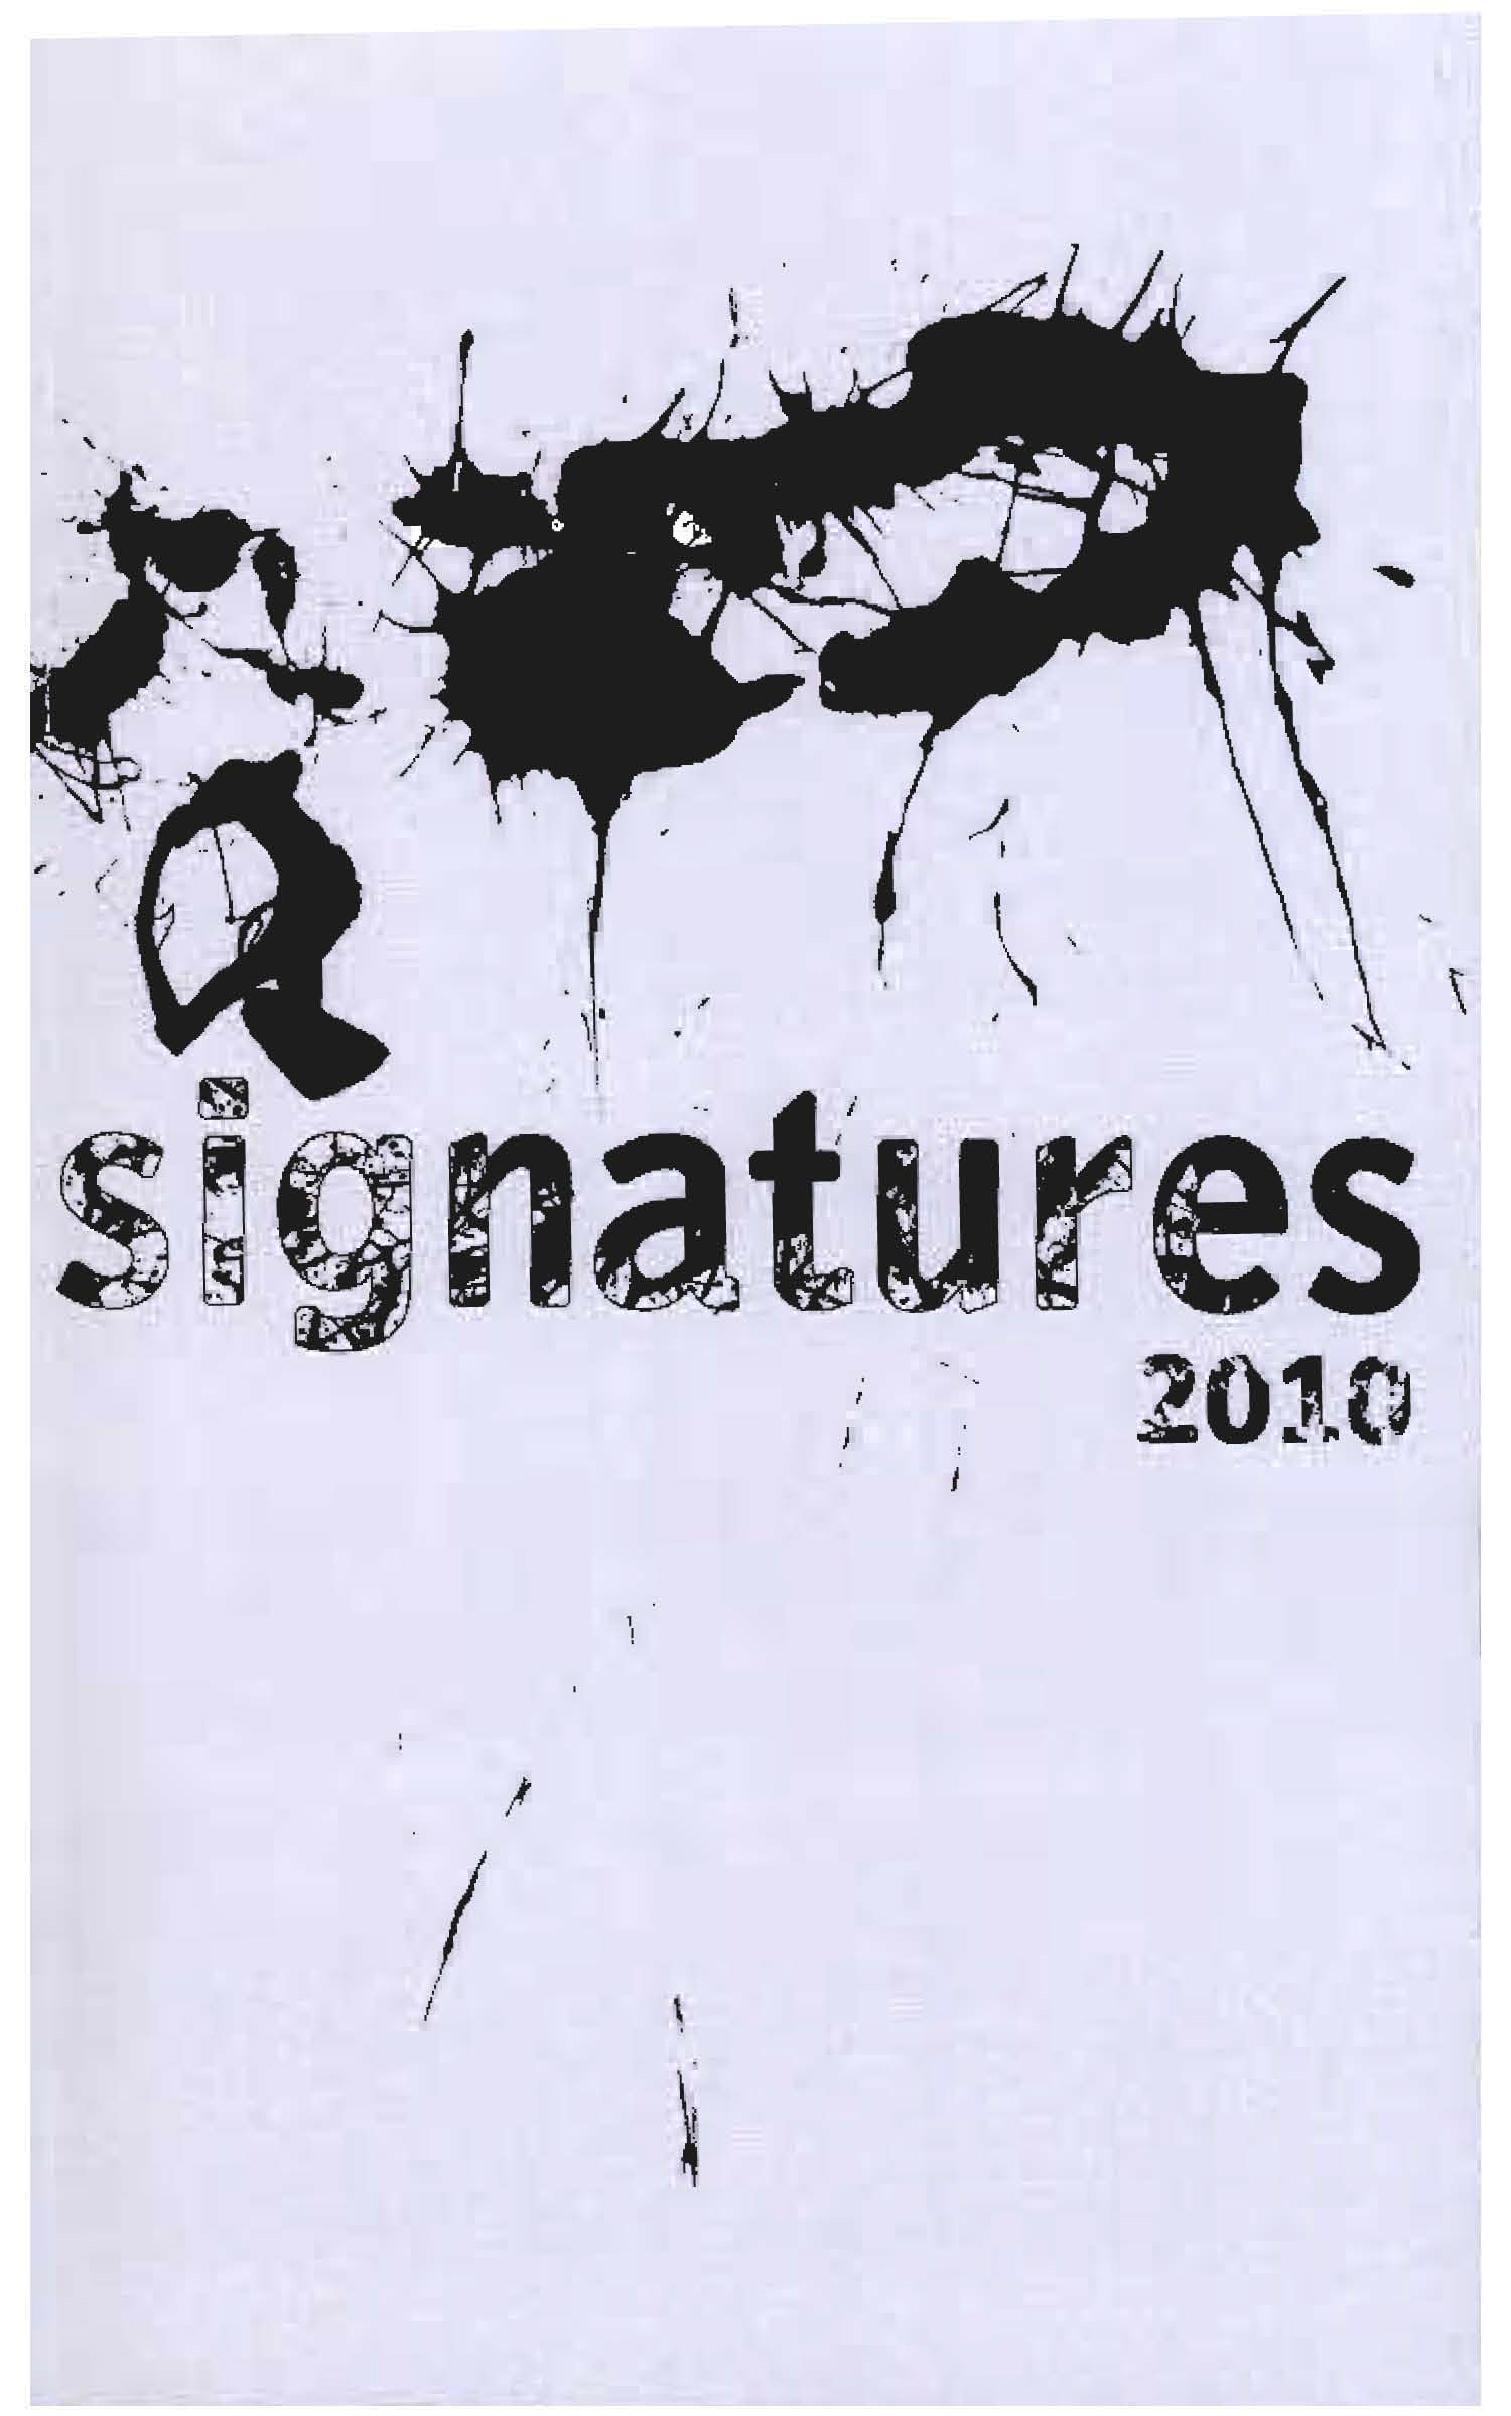 SignaturesBook2010-1.jpg